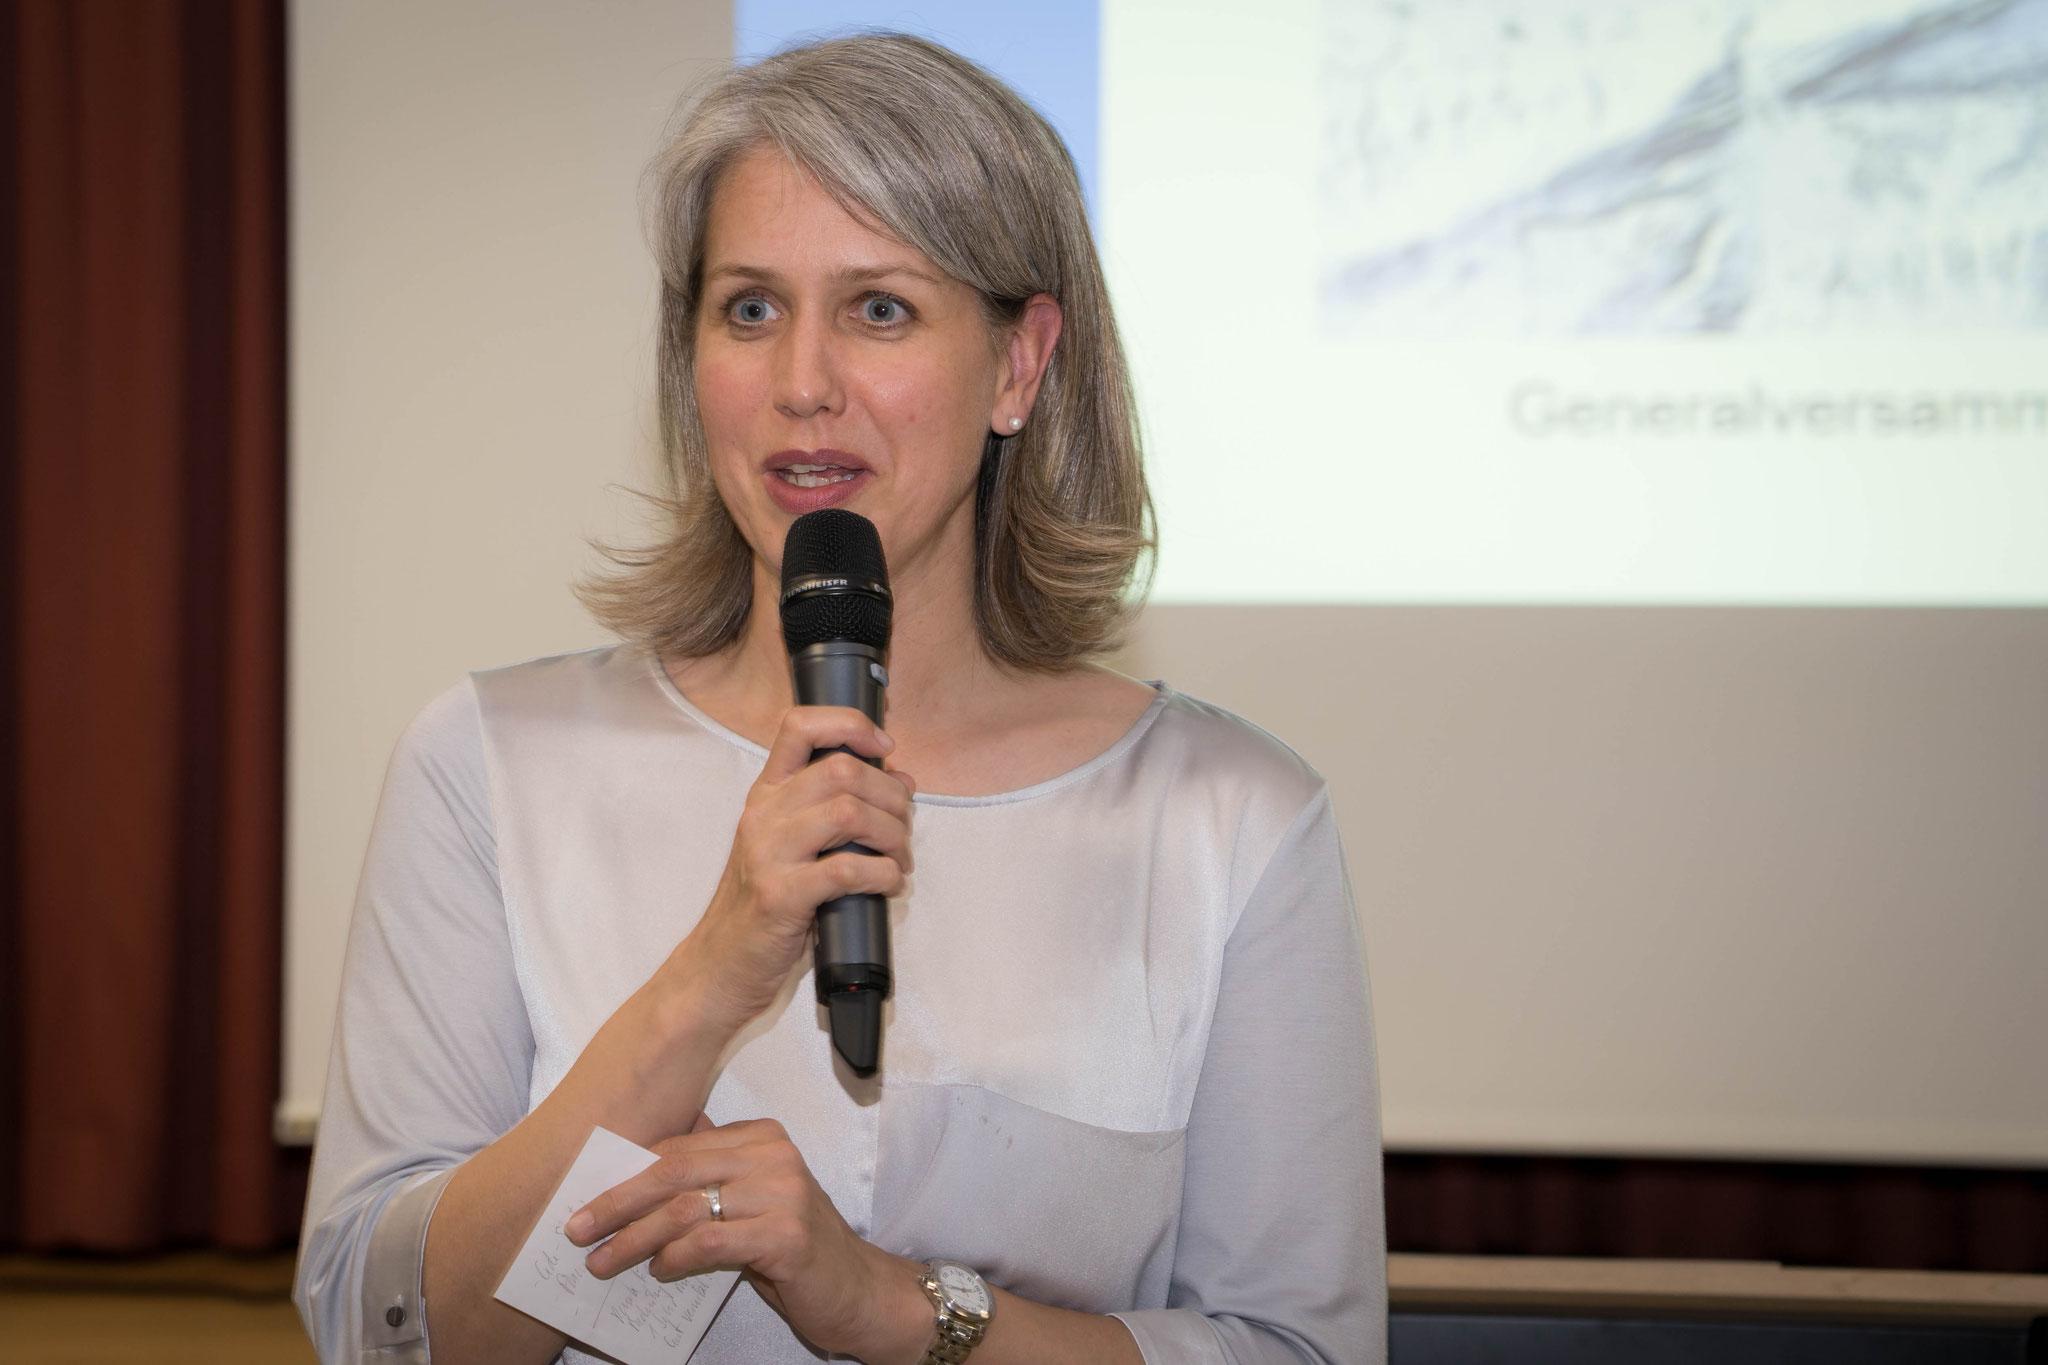 Stadträtin Franziska Bitzi überbringt die Grüsse aus dem Stadtrat ...